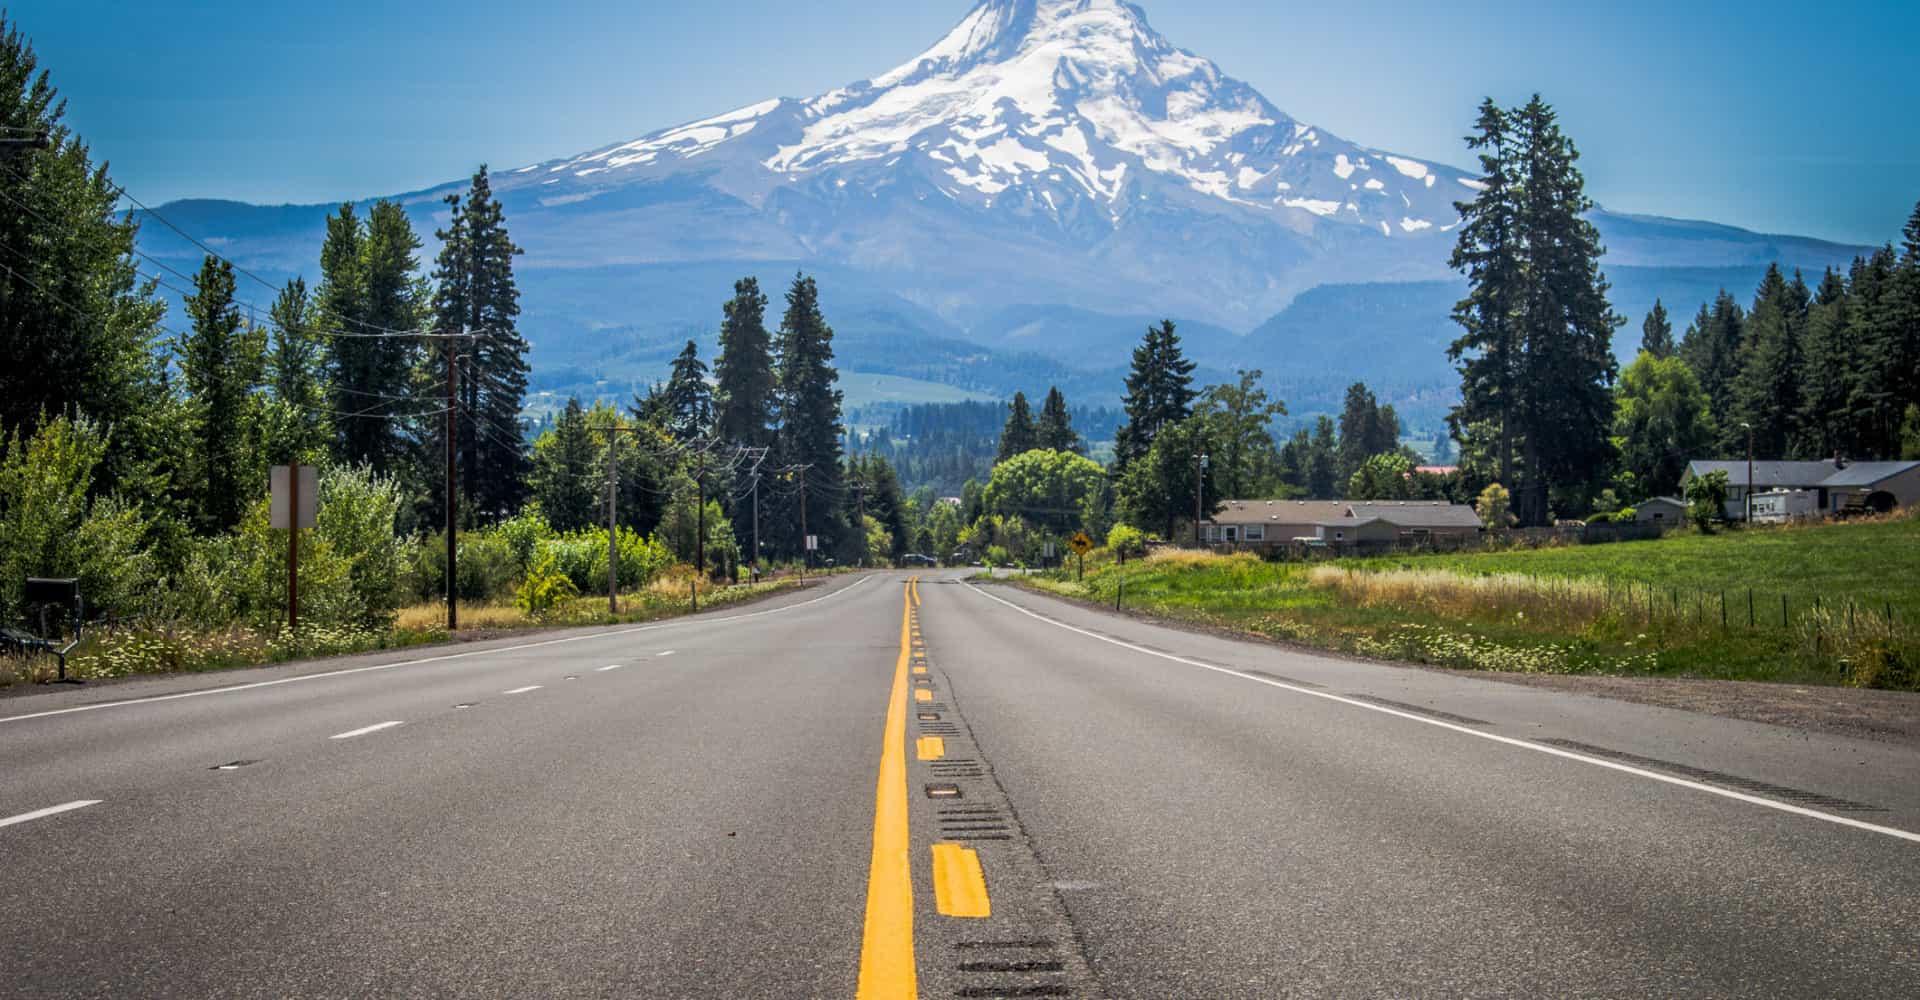 Road trip blog